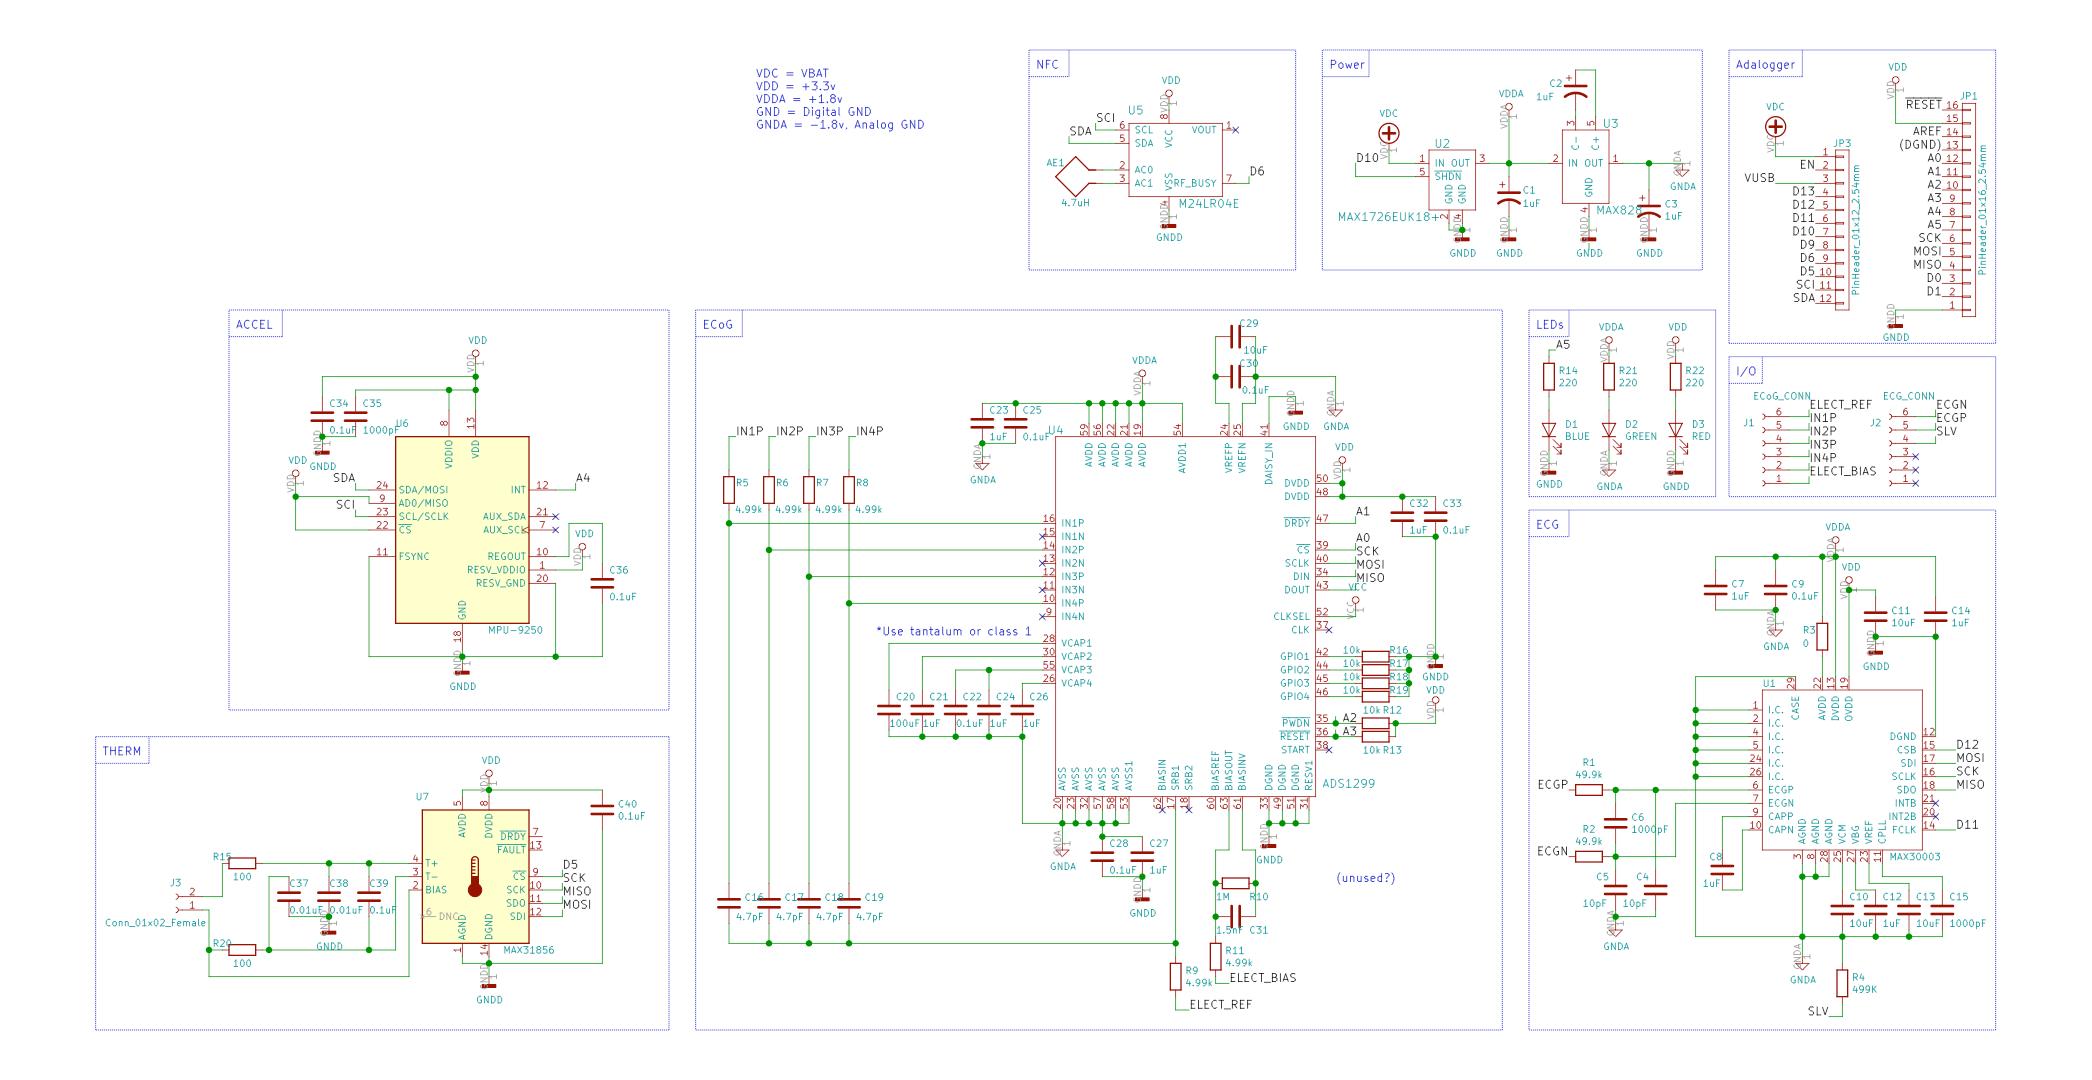 ARBO v1.0 Schematic